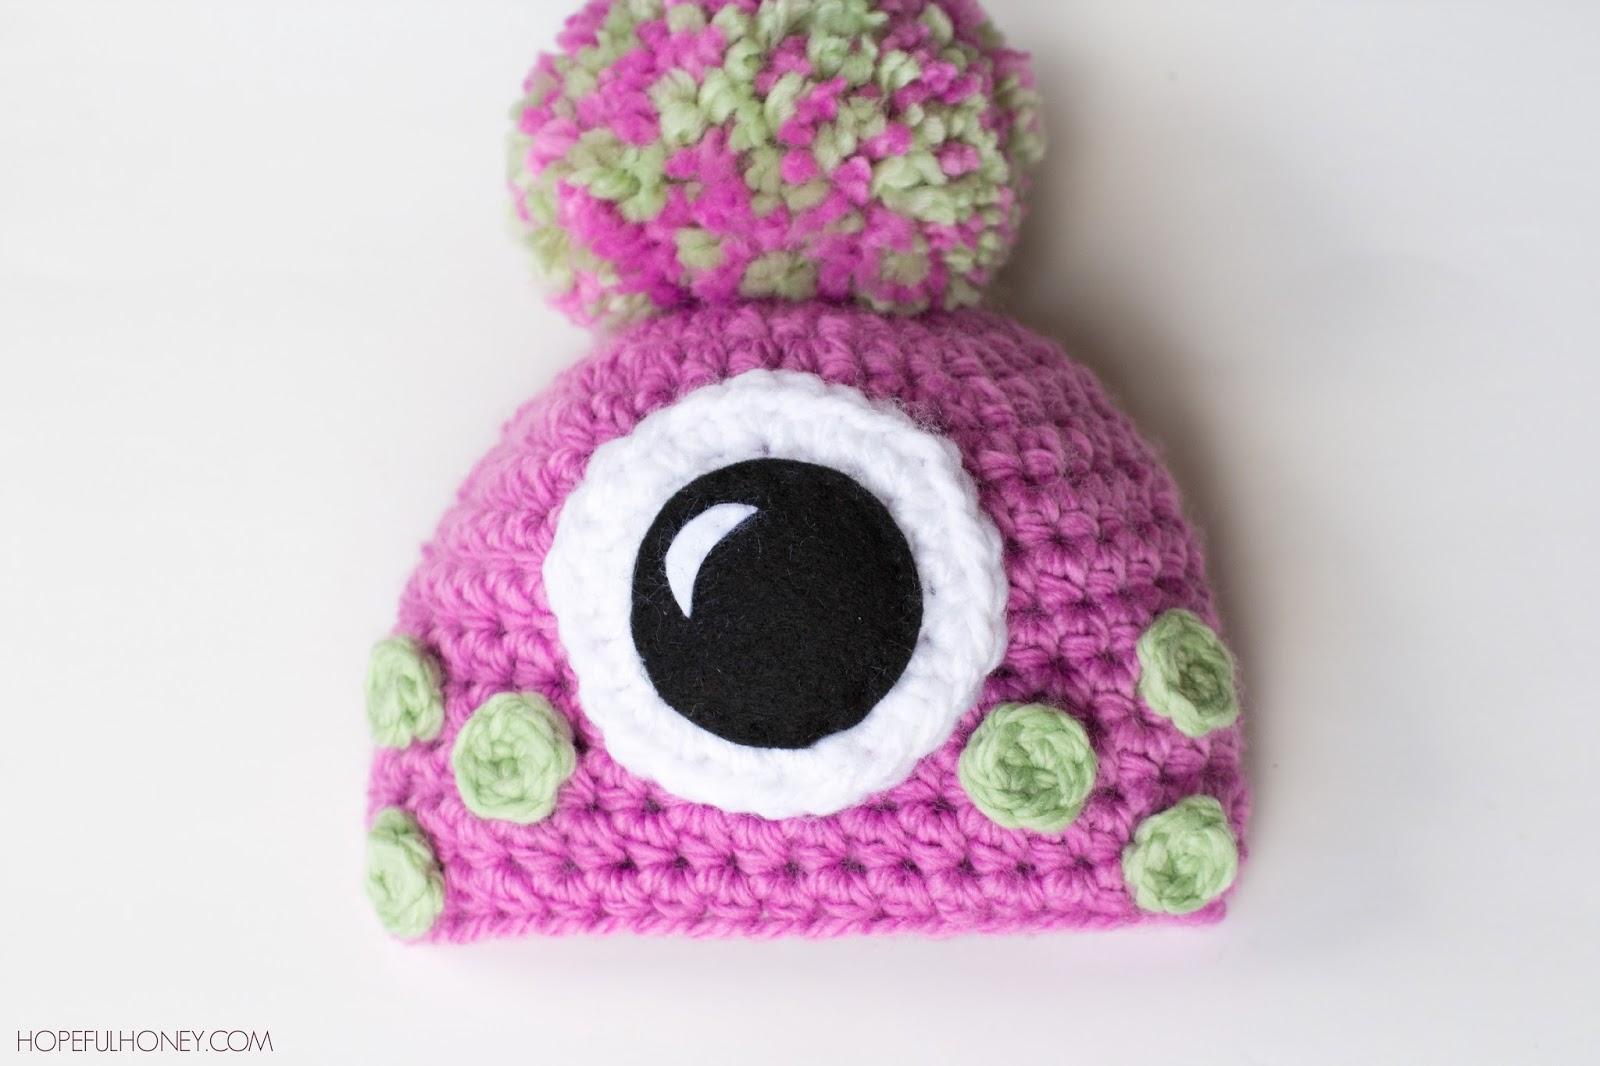 Hopeful Honey Craft, Crochet, Create: Freckled Baby ...